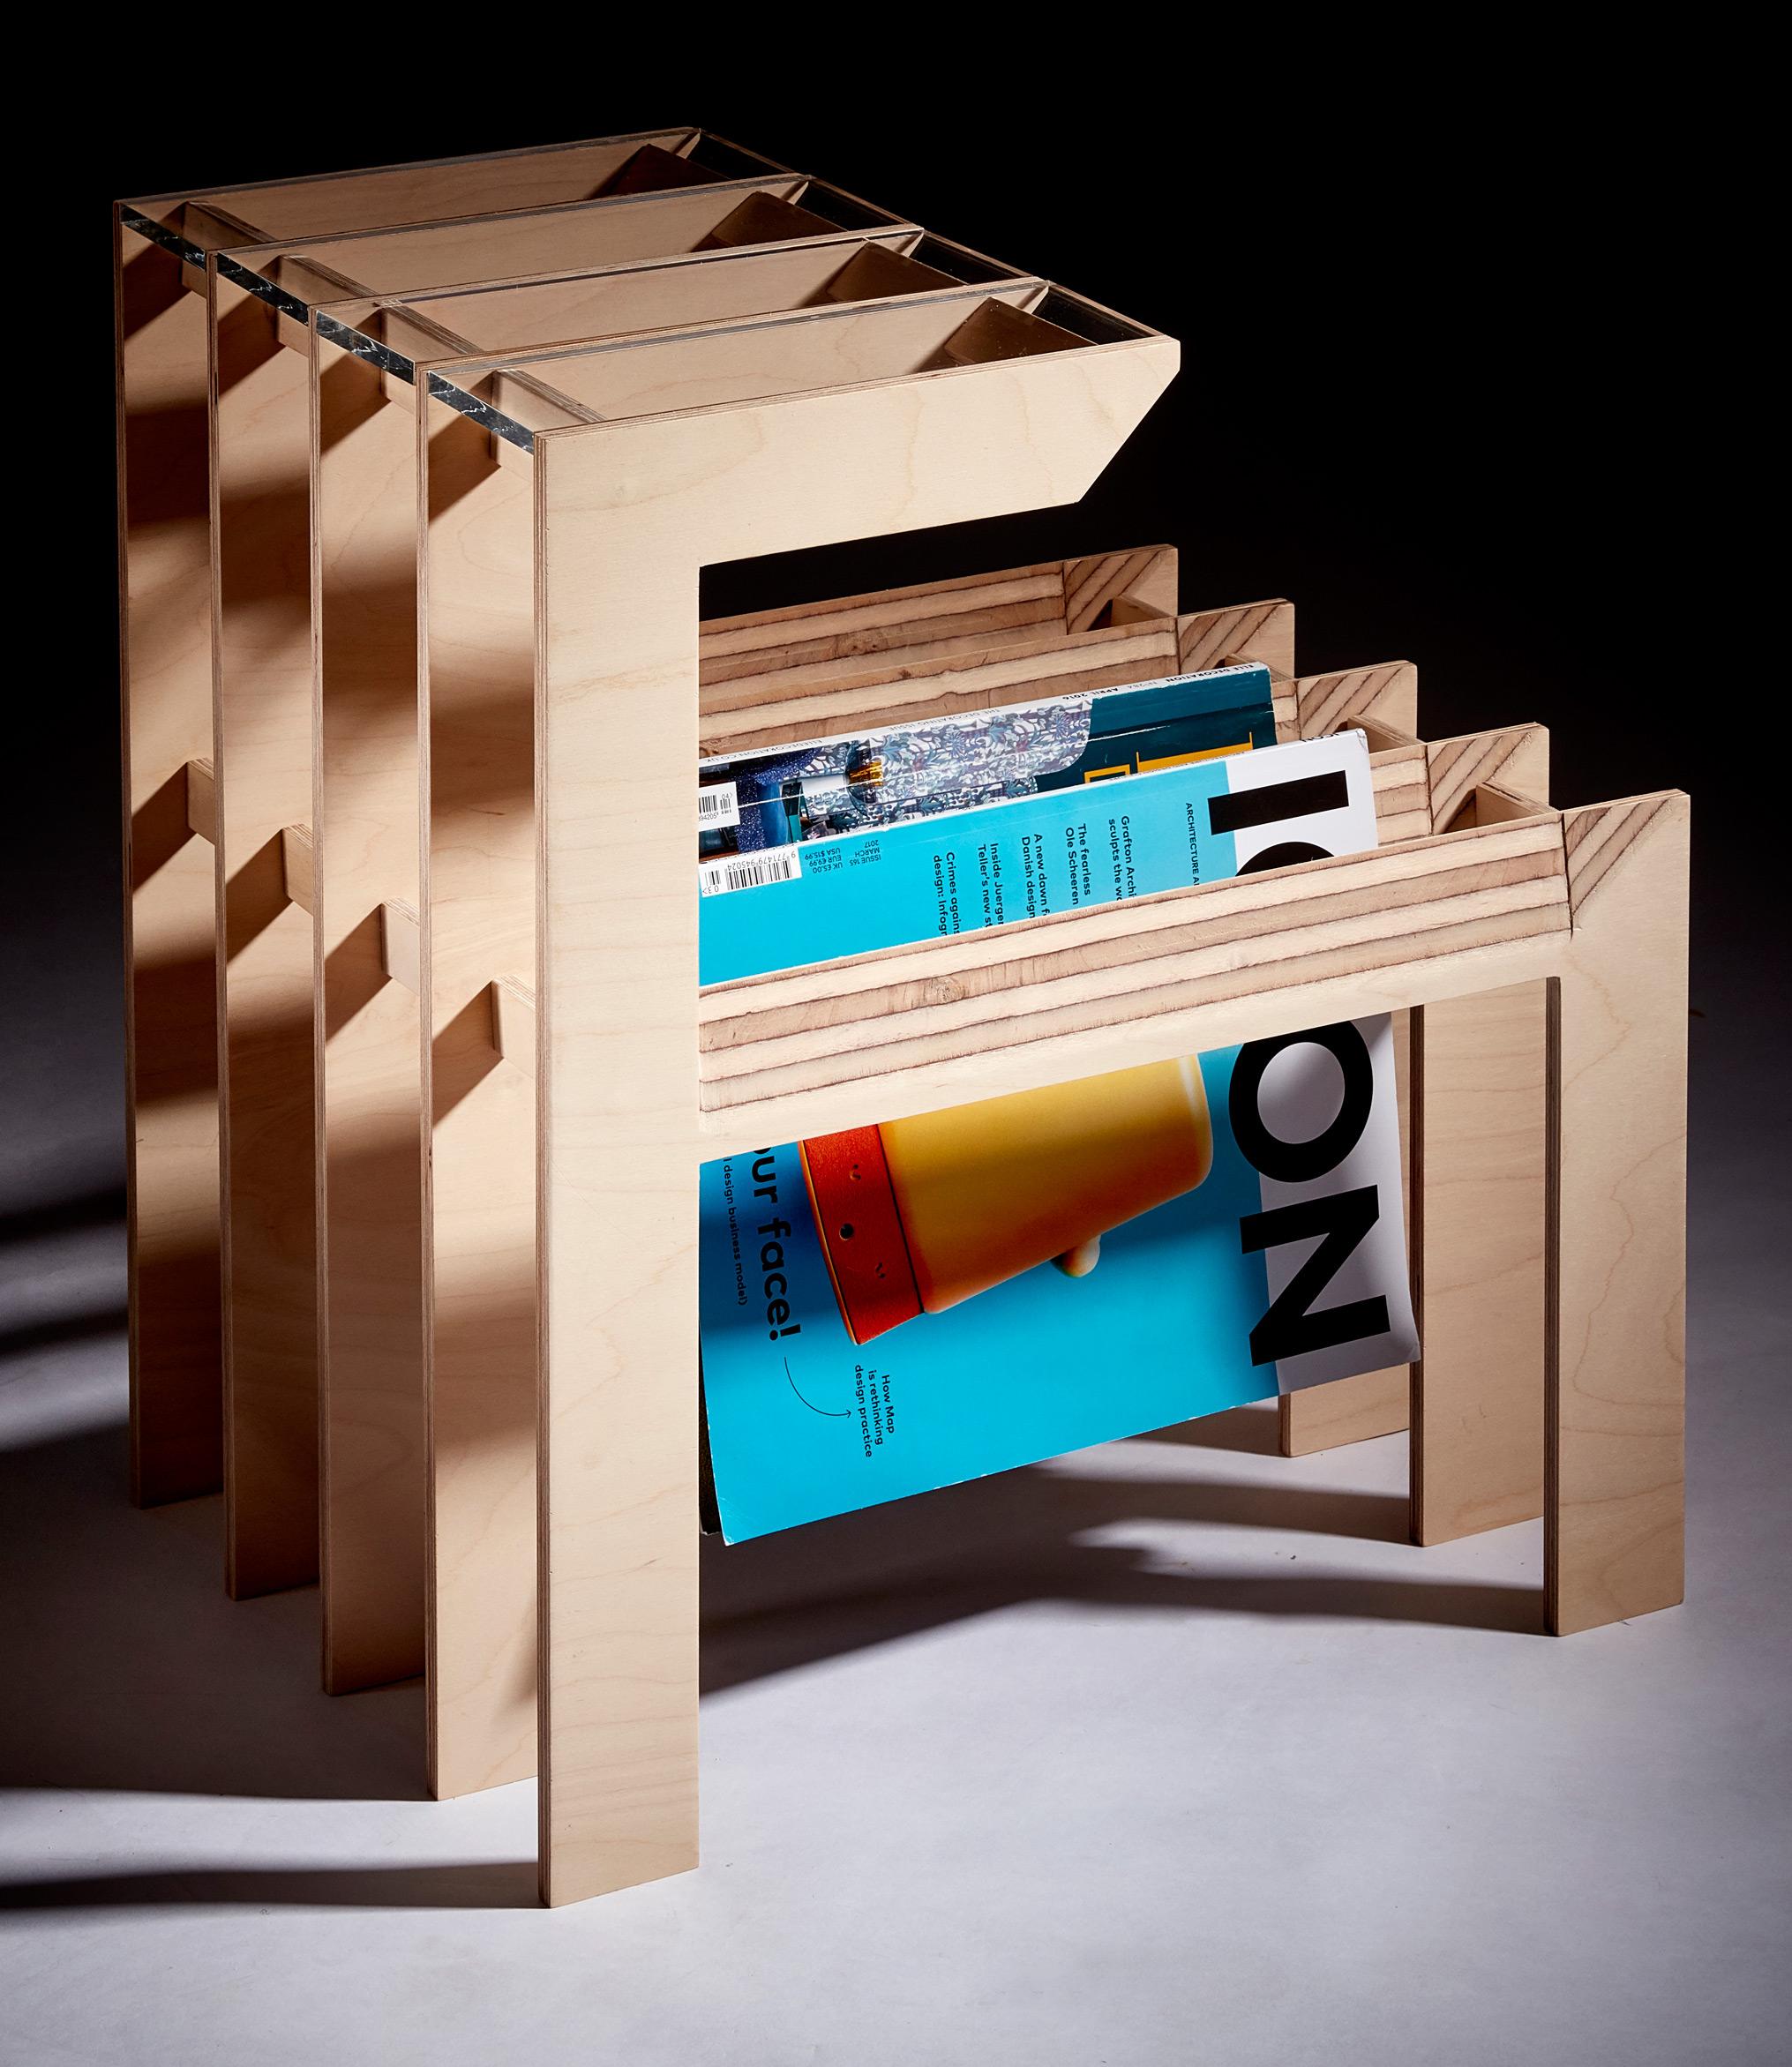 Furniture-modern-geometric-magazine-rack.jpg